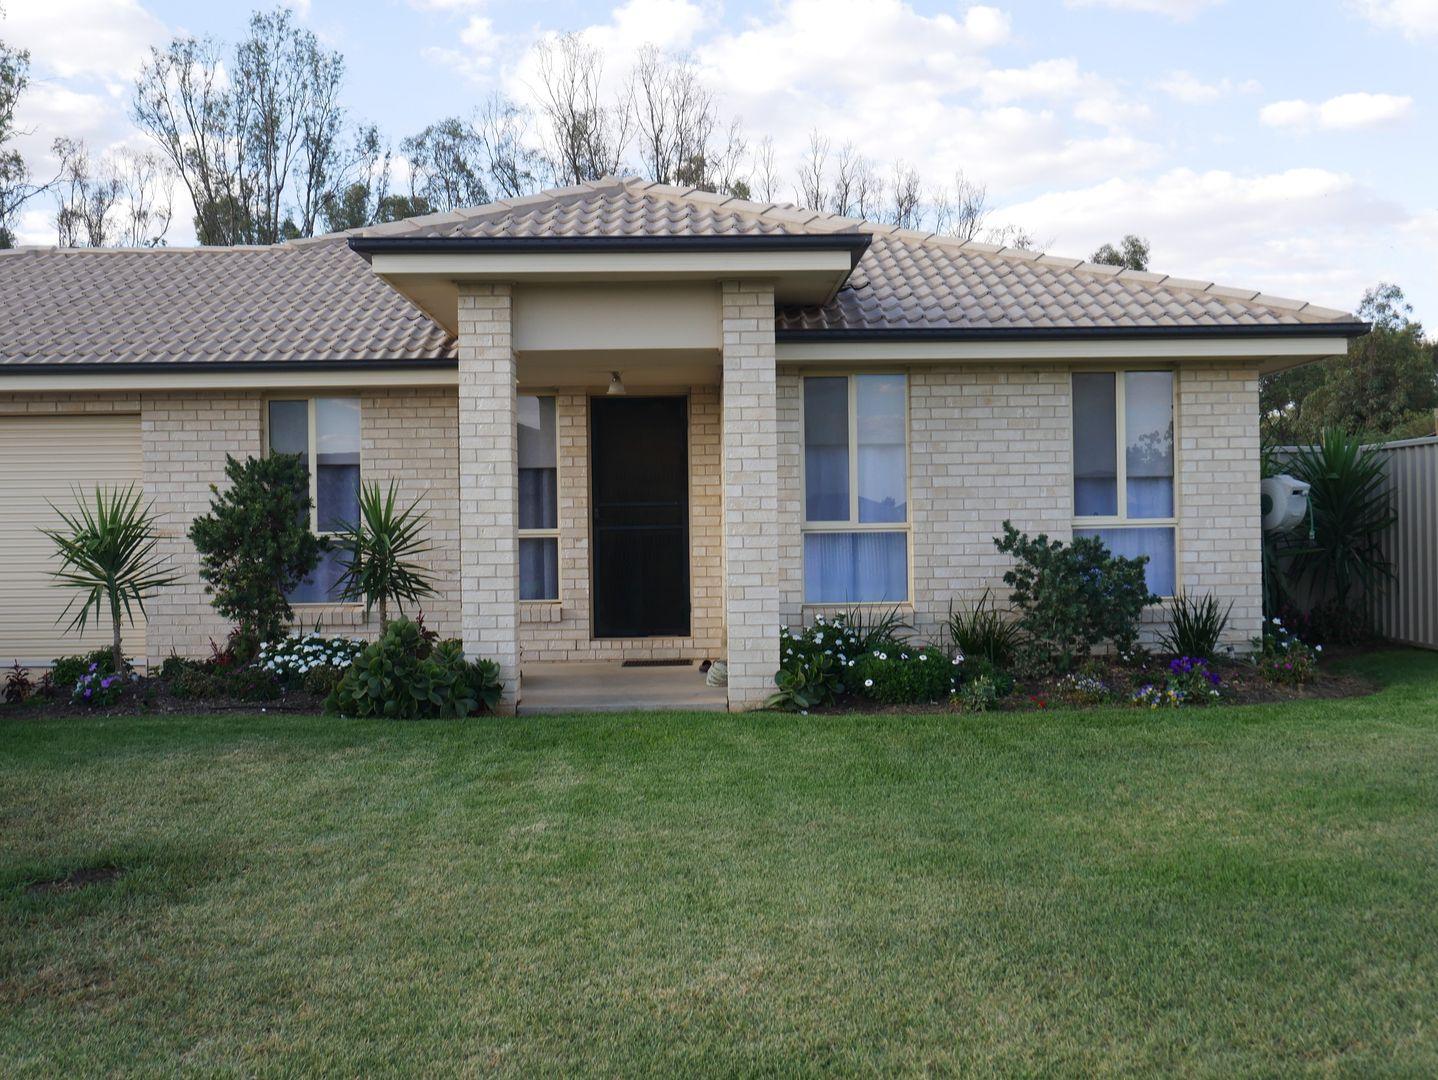 25 Golf Club Drive, Leeton NSW 2705, Image 0